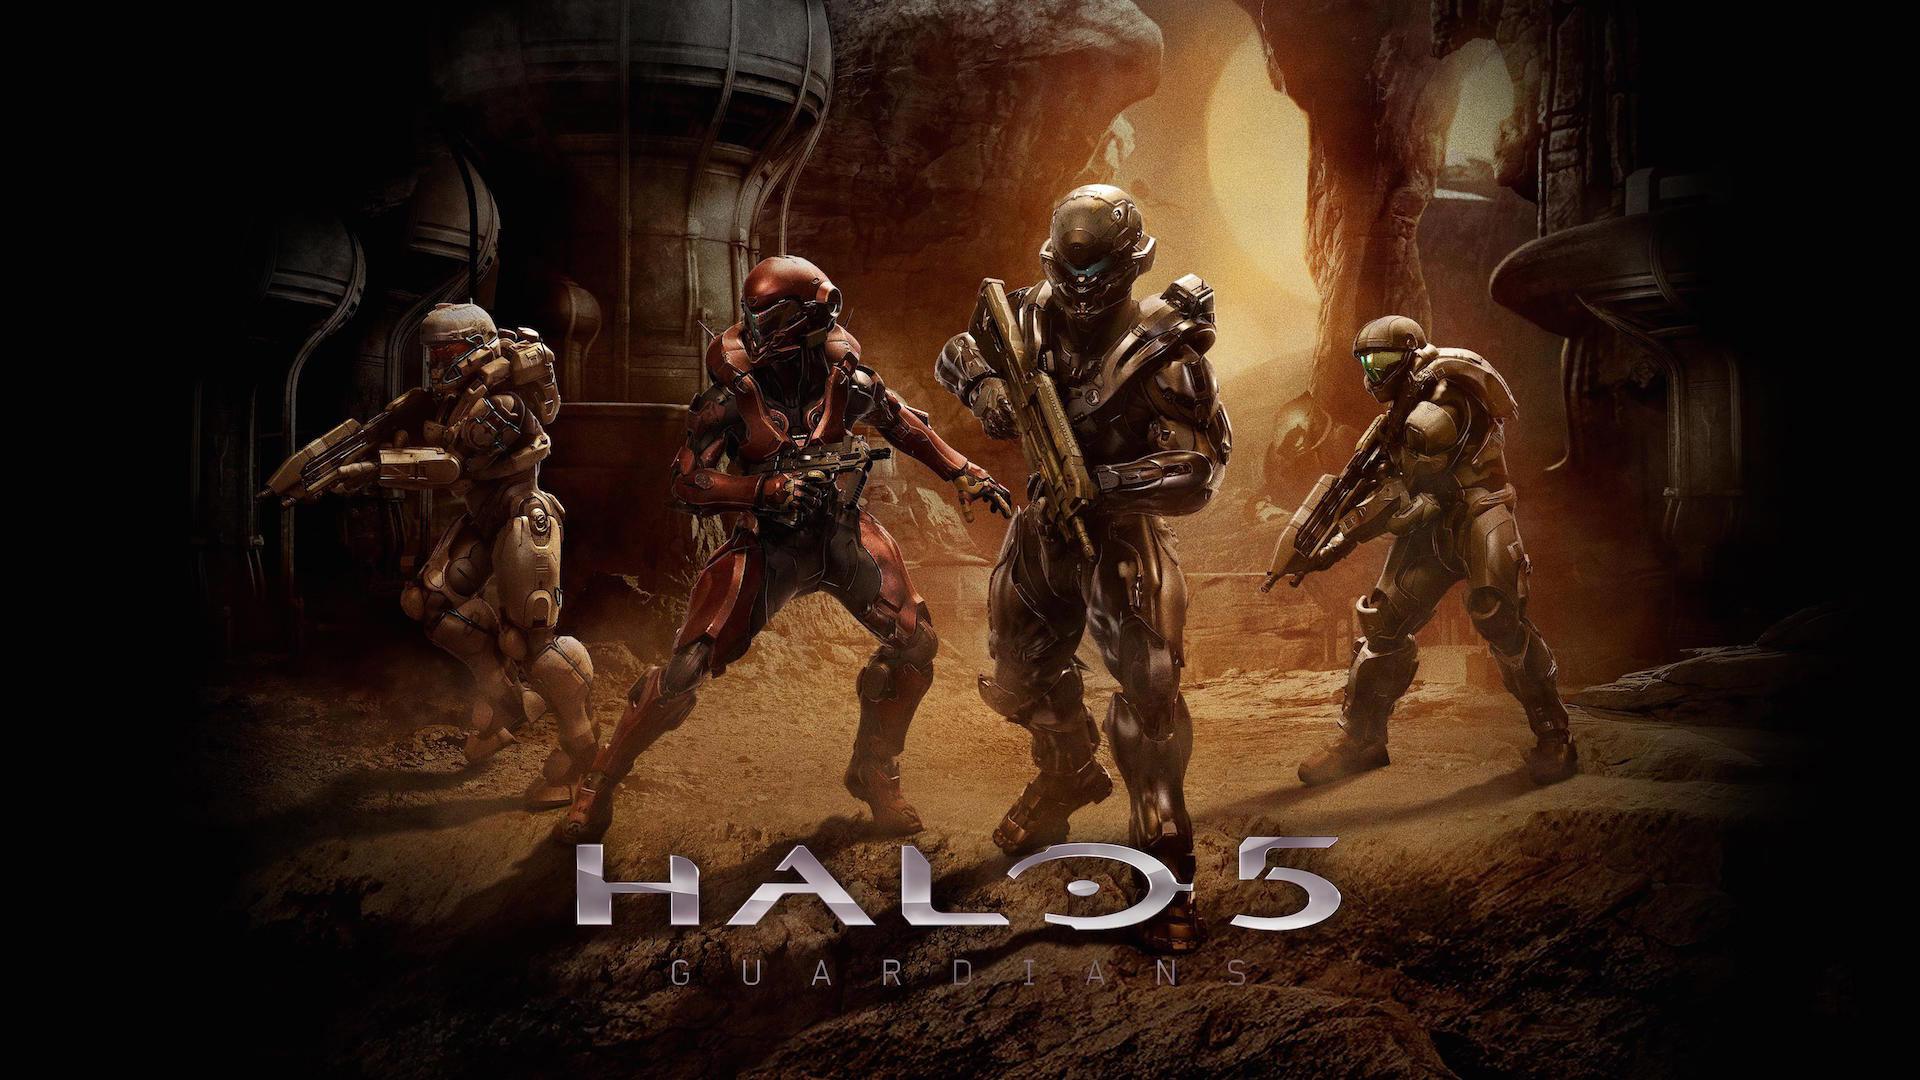 Halo 5: Guardians Wallpaper in 1920x1080